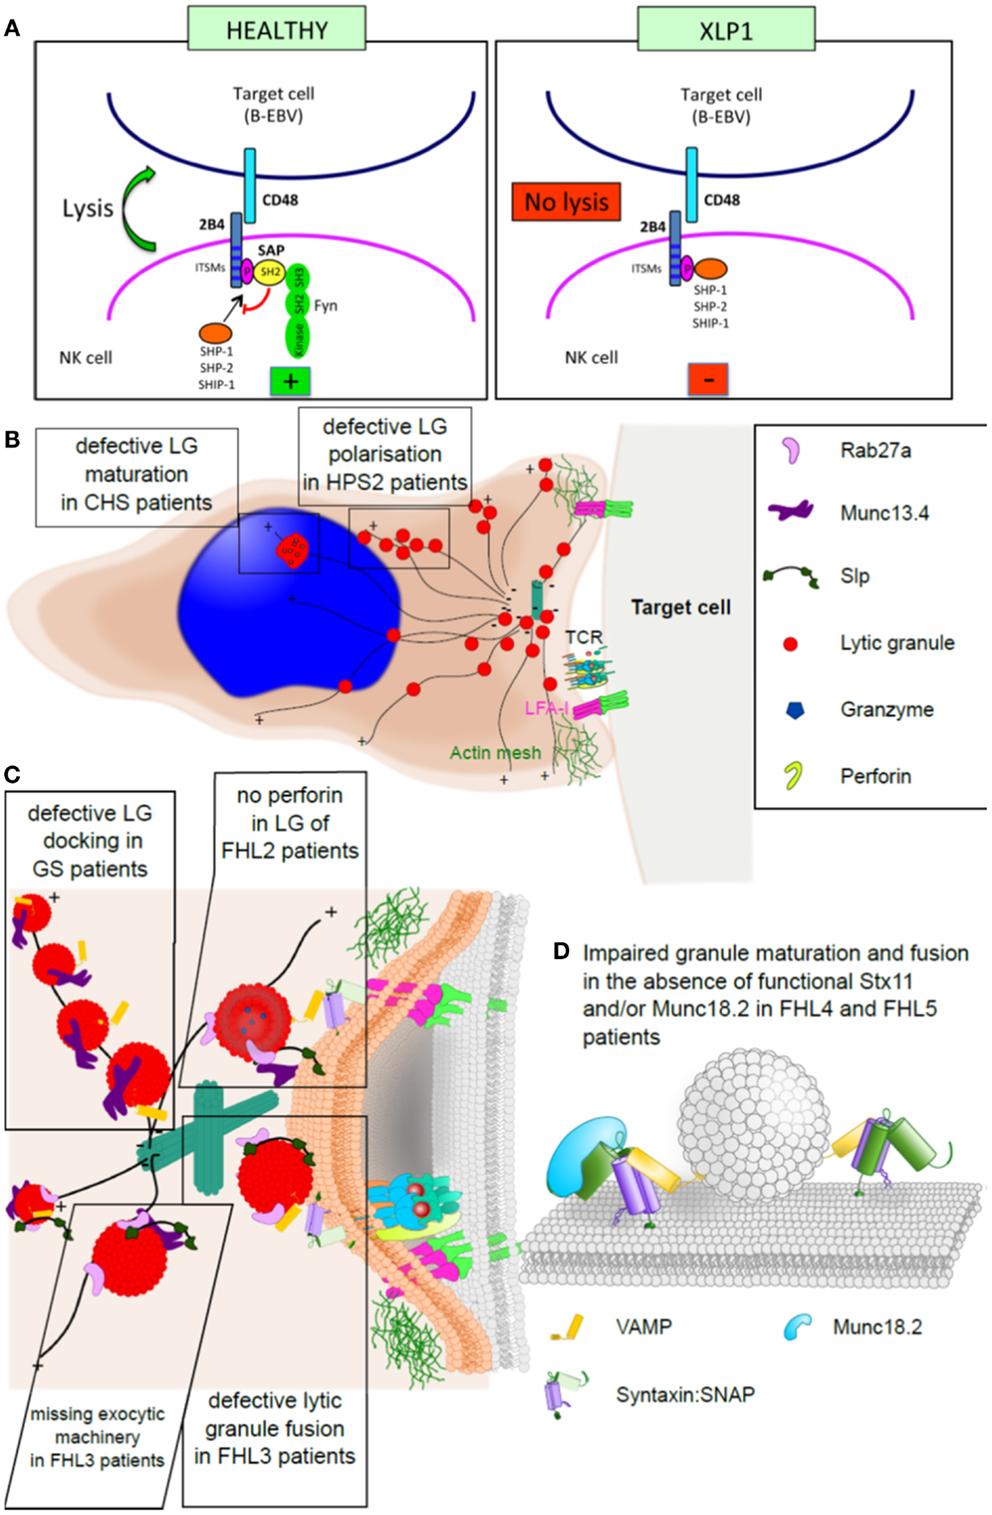 cancer in familial hemophagocytic lymphohistiocytosis paraziți interni la imaginile oamenilor